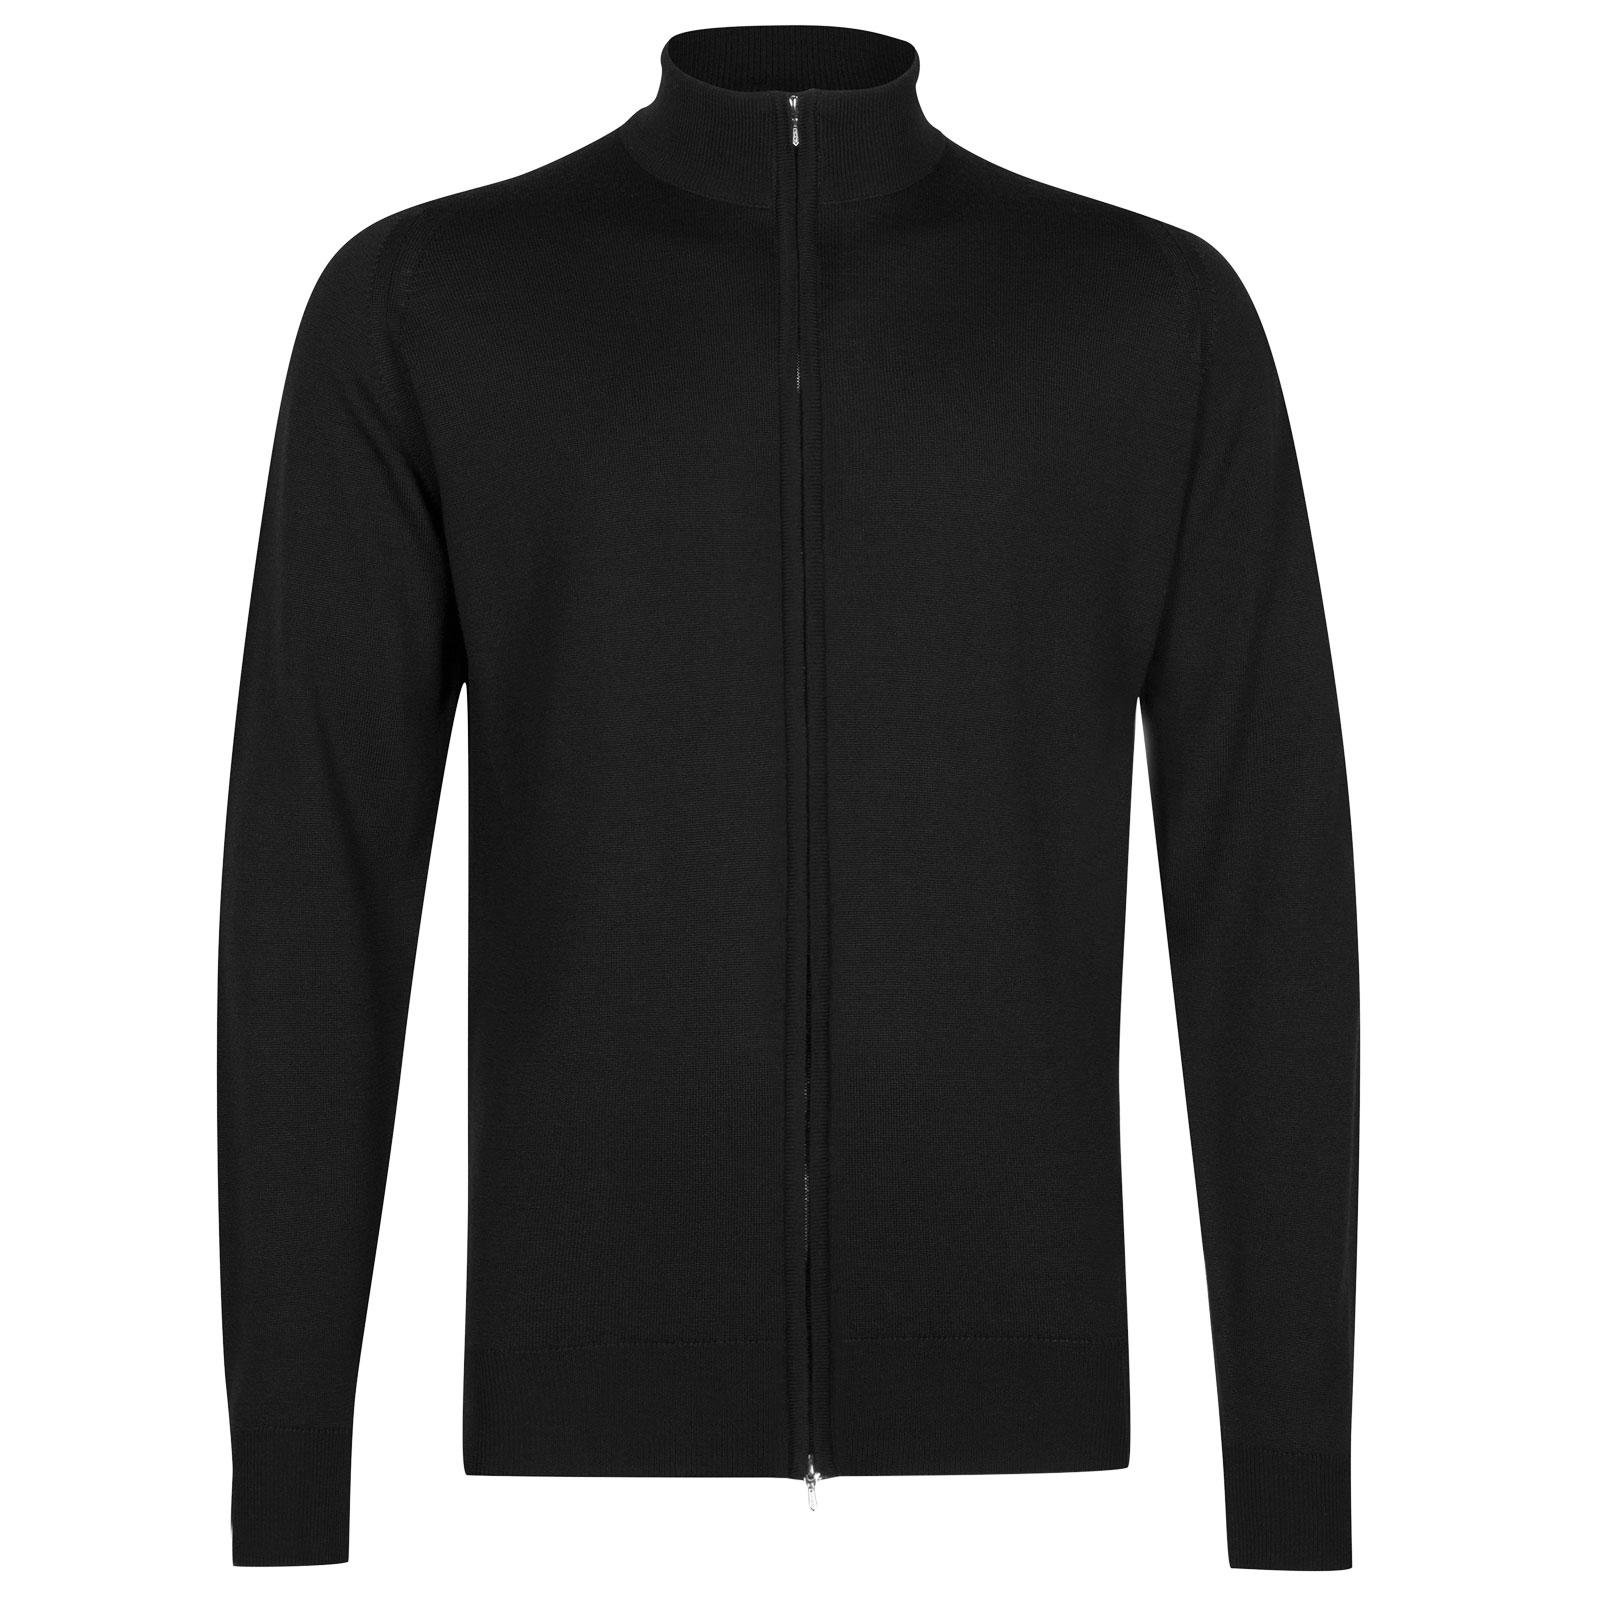 John Smedley claygate Merino Wool Jacket in Black-L